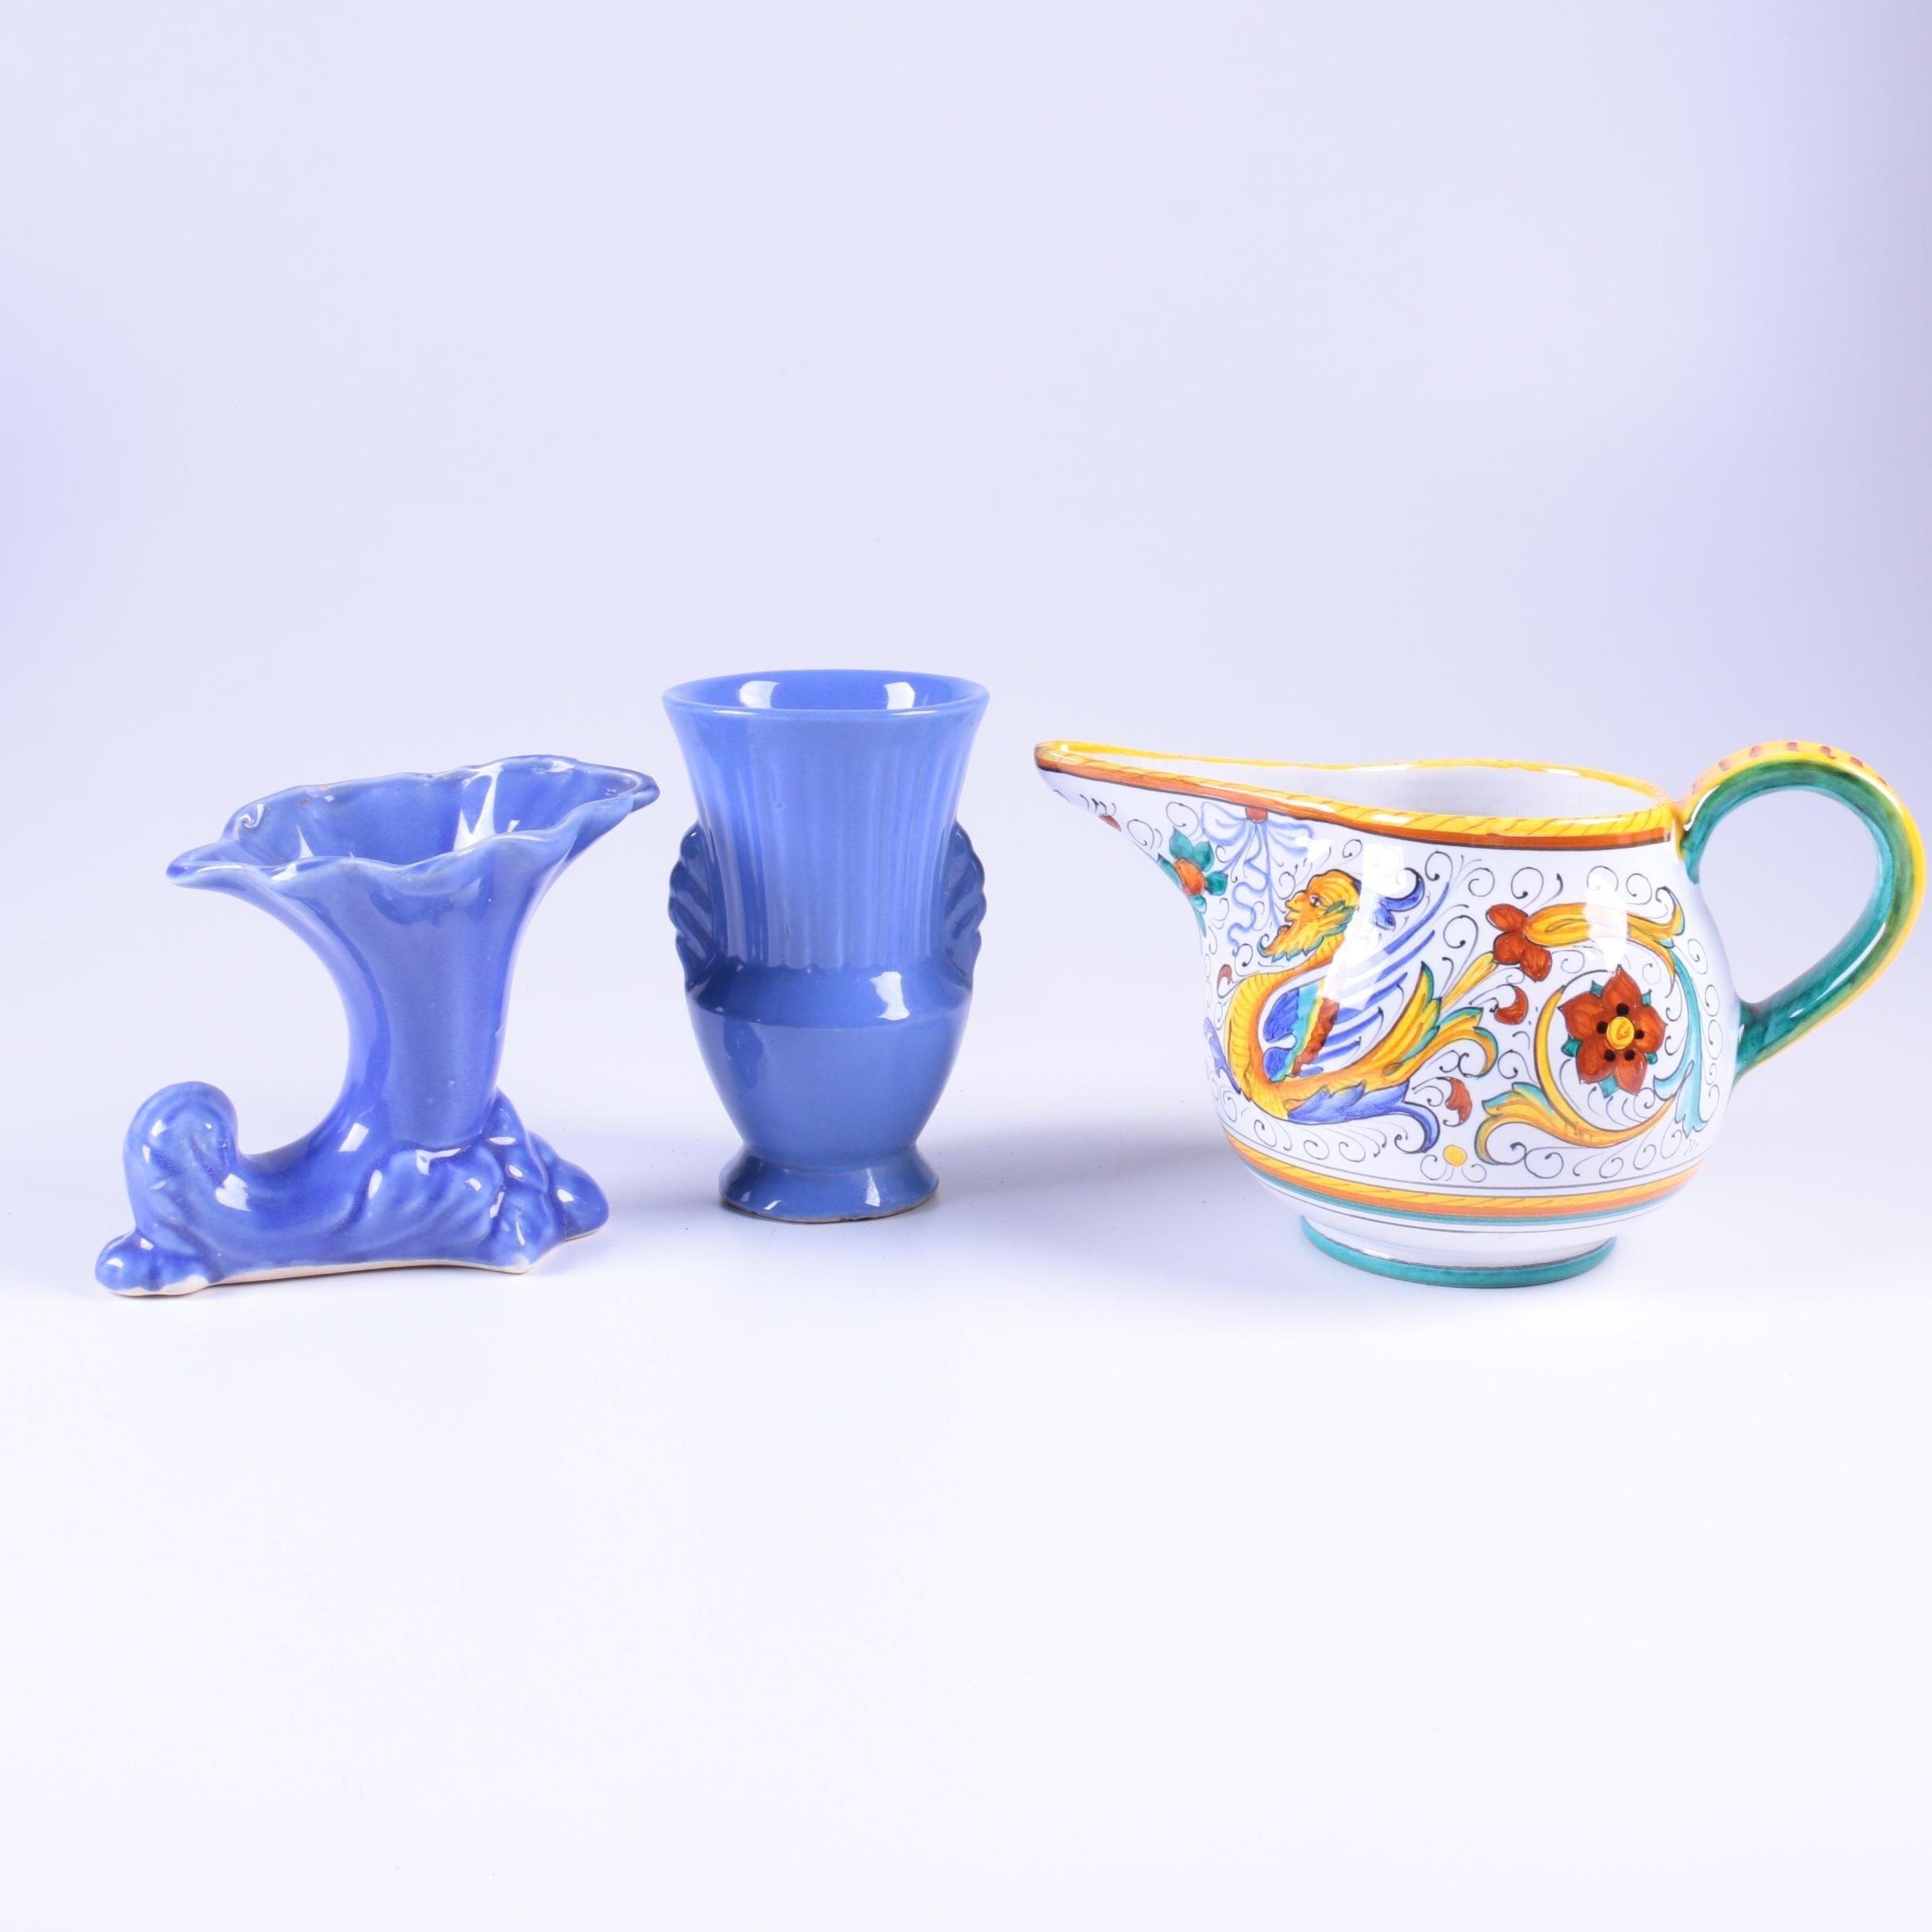 Deruta Italian Pottery Planter and Mid Century Pottery